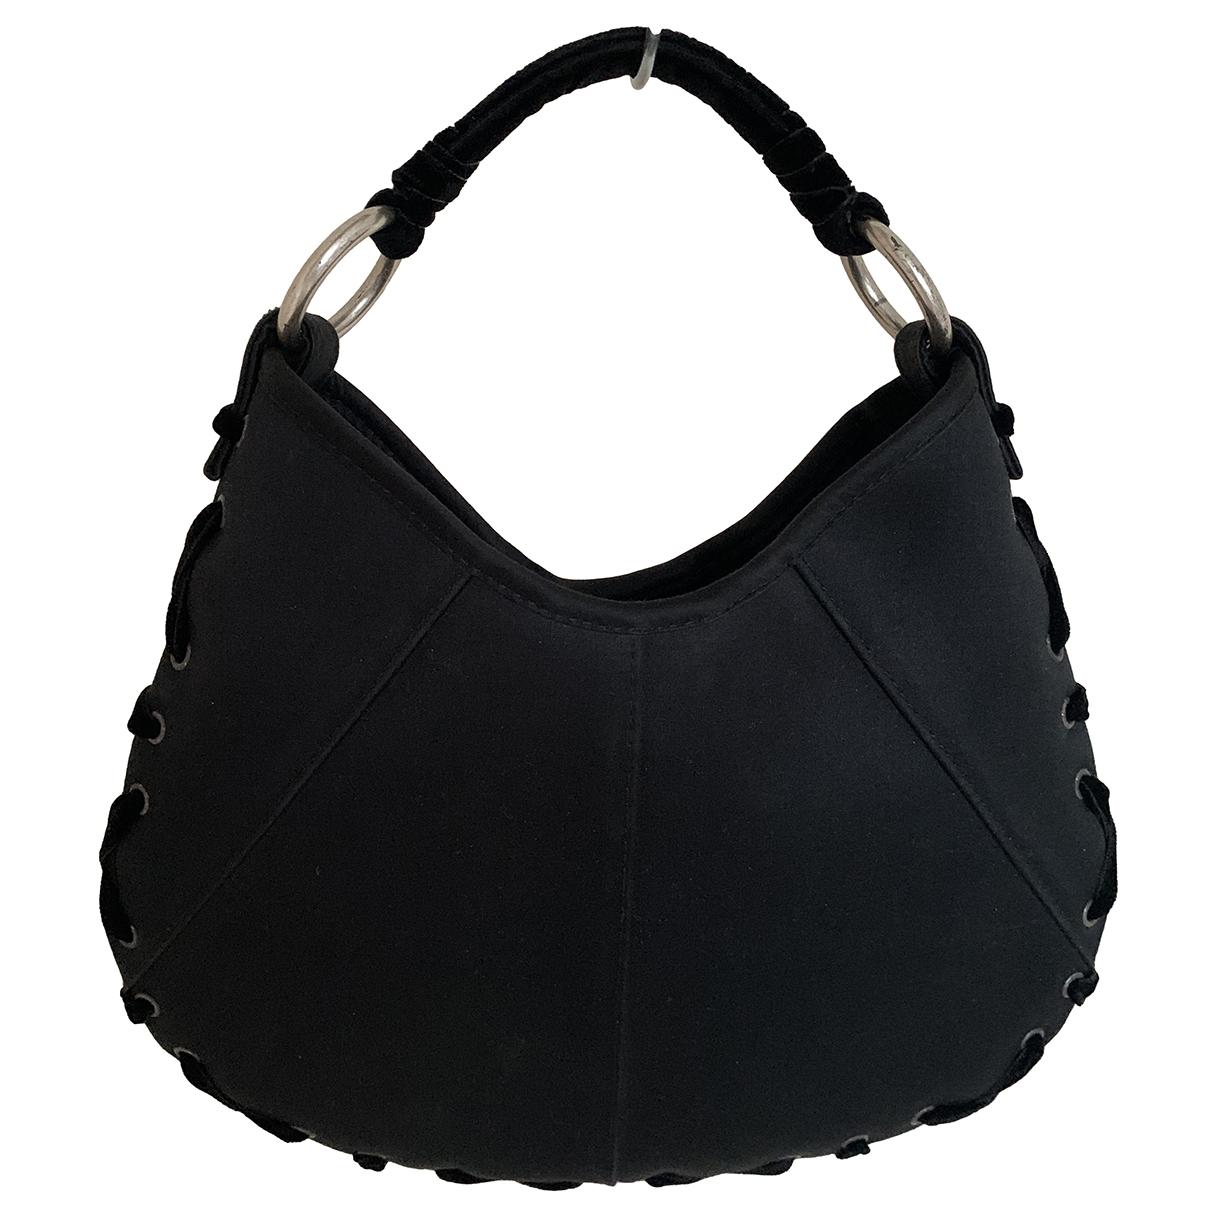 Yves Saint Laurent \N Handtasche in  Schwarz Seide